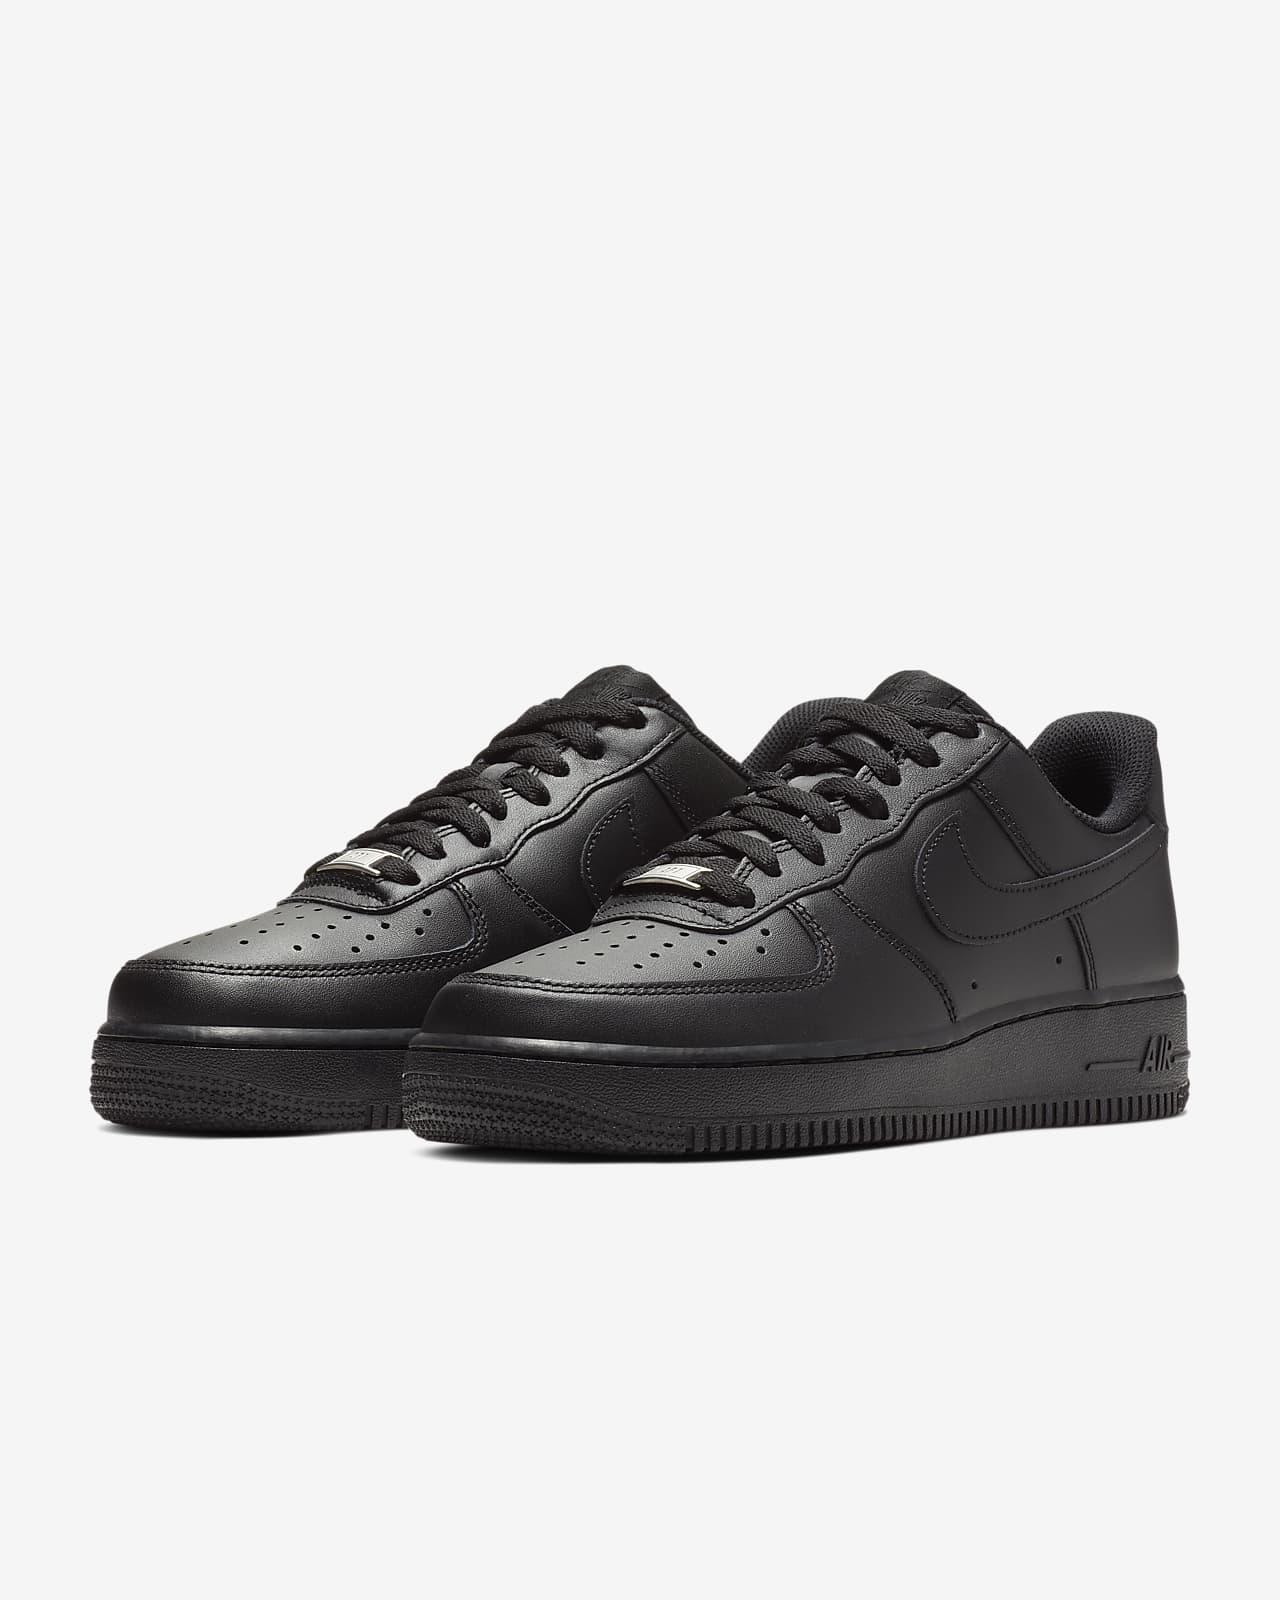 insulto desempleo Nylon  Nike Air Force 1 '07 Women's Shoe. Nike RO